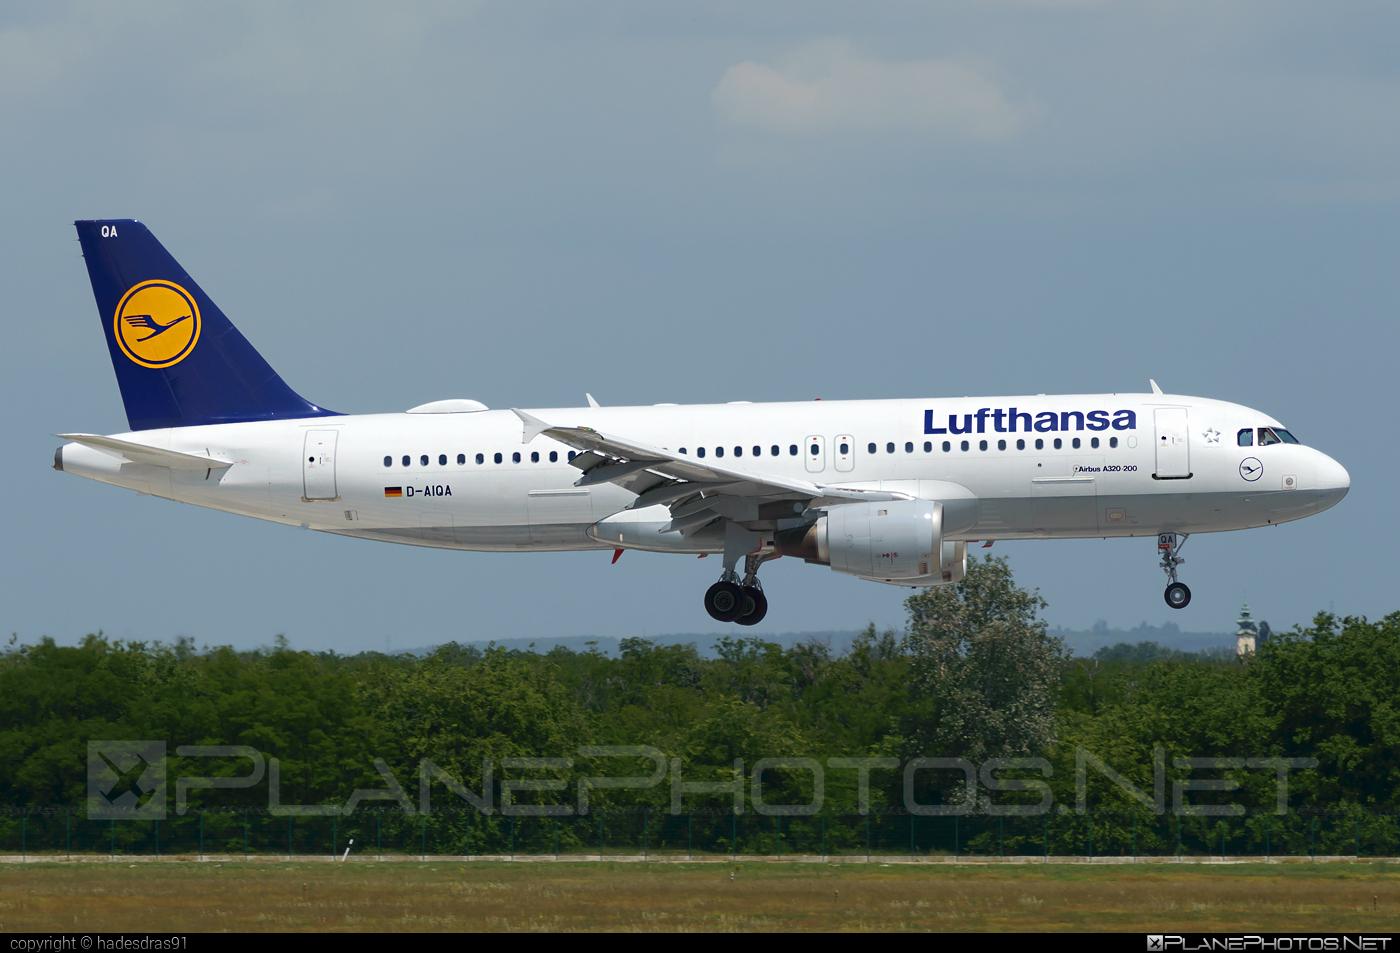 Airbus A320-211 - D-AIQA operated by Lufthansa #a320 #a320family #airbus #airbus320 #lufthansa